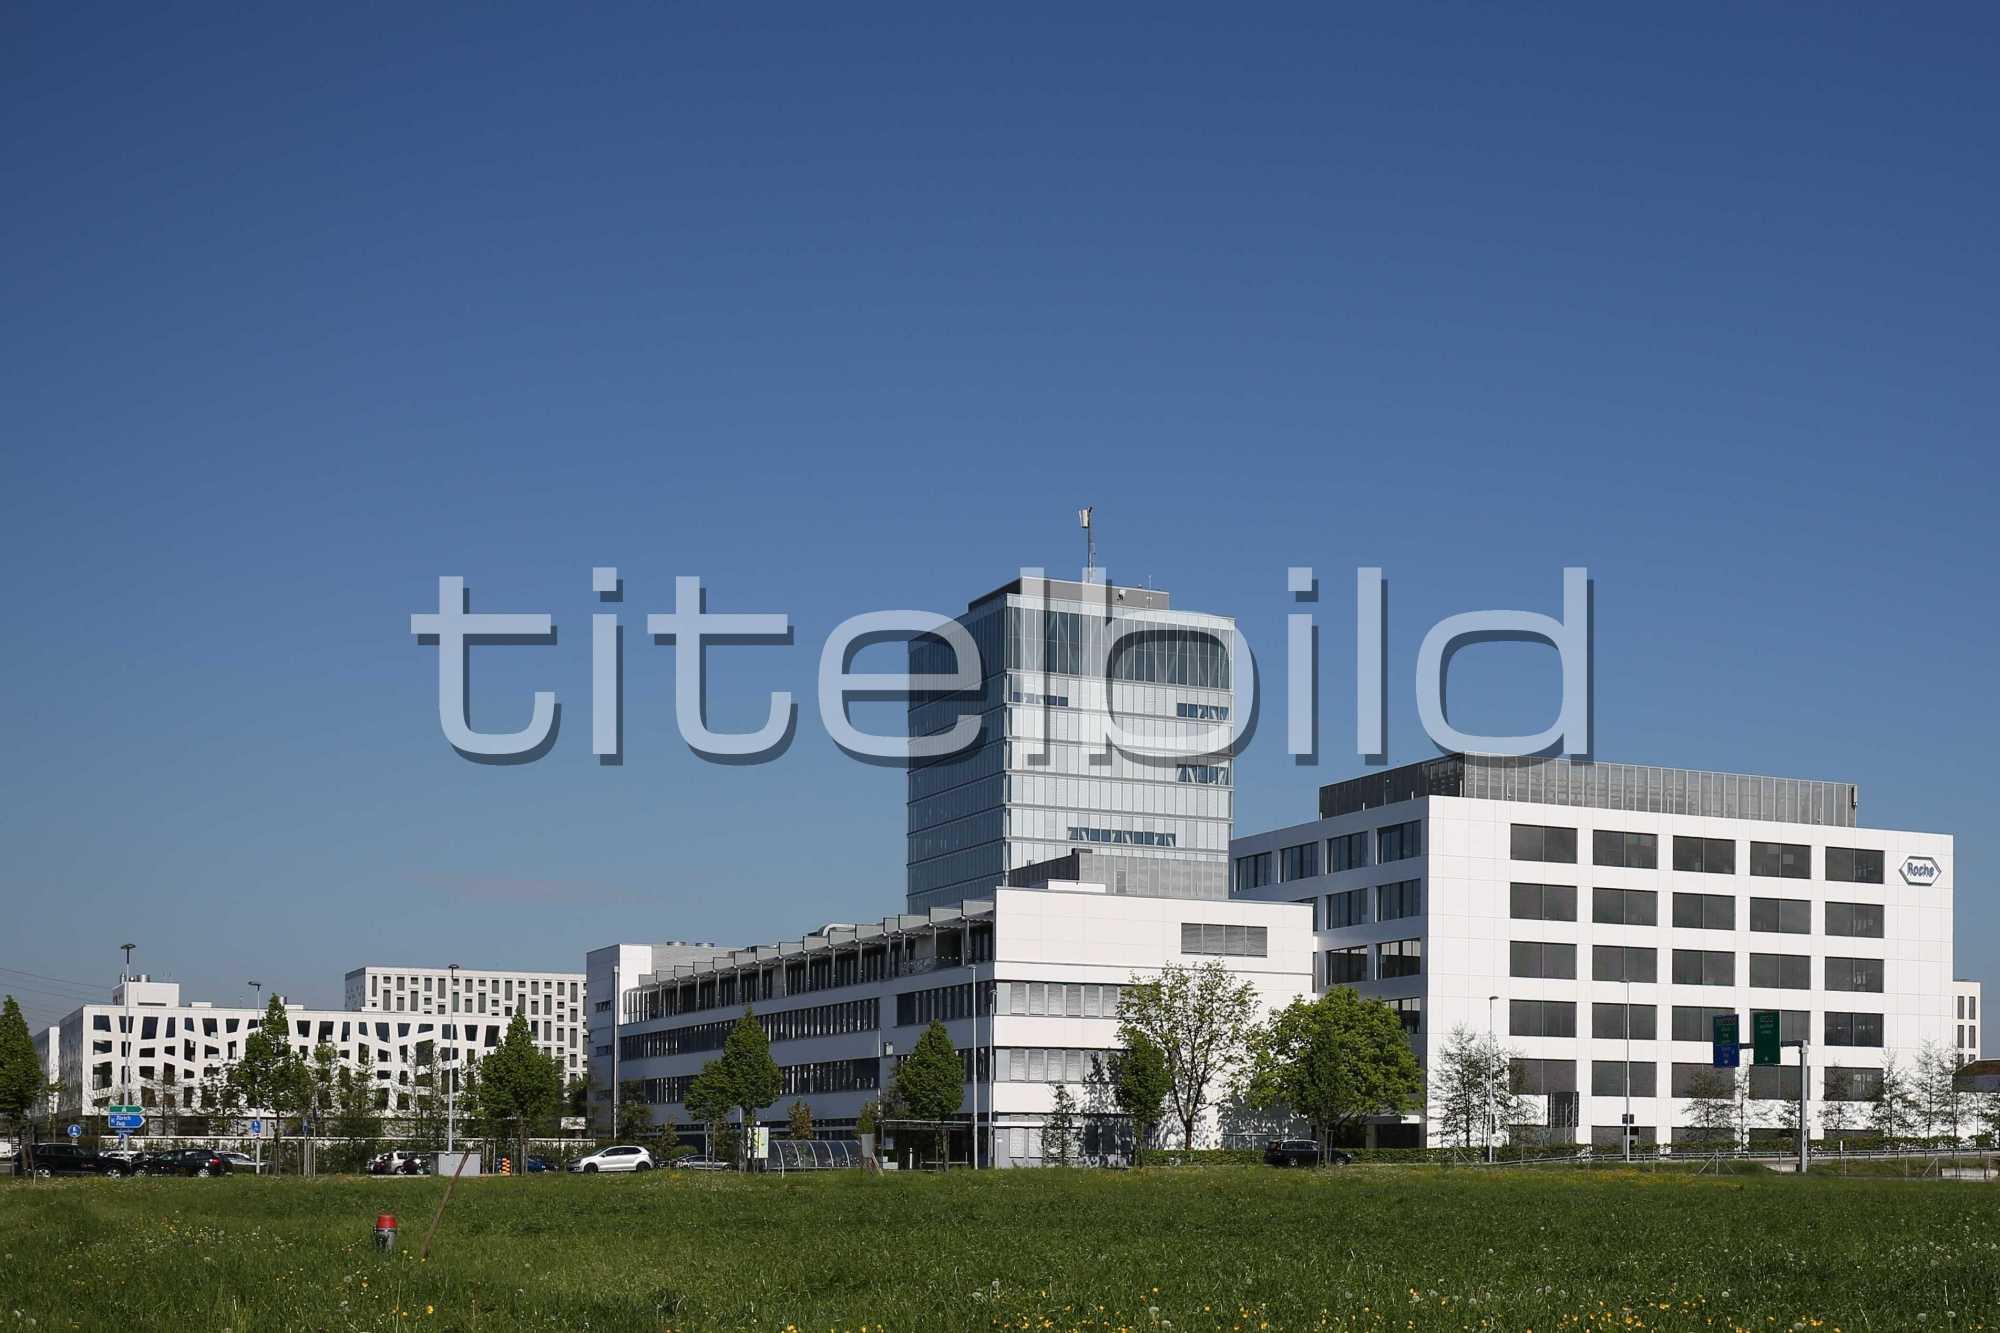 Projektbild-Nr. 2: Neubau Roche Rotkreuz Bau 7